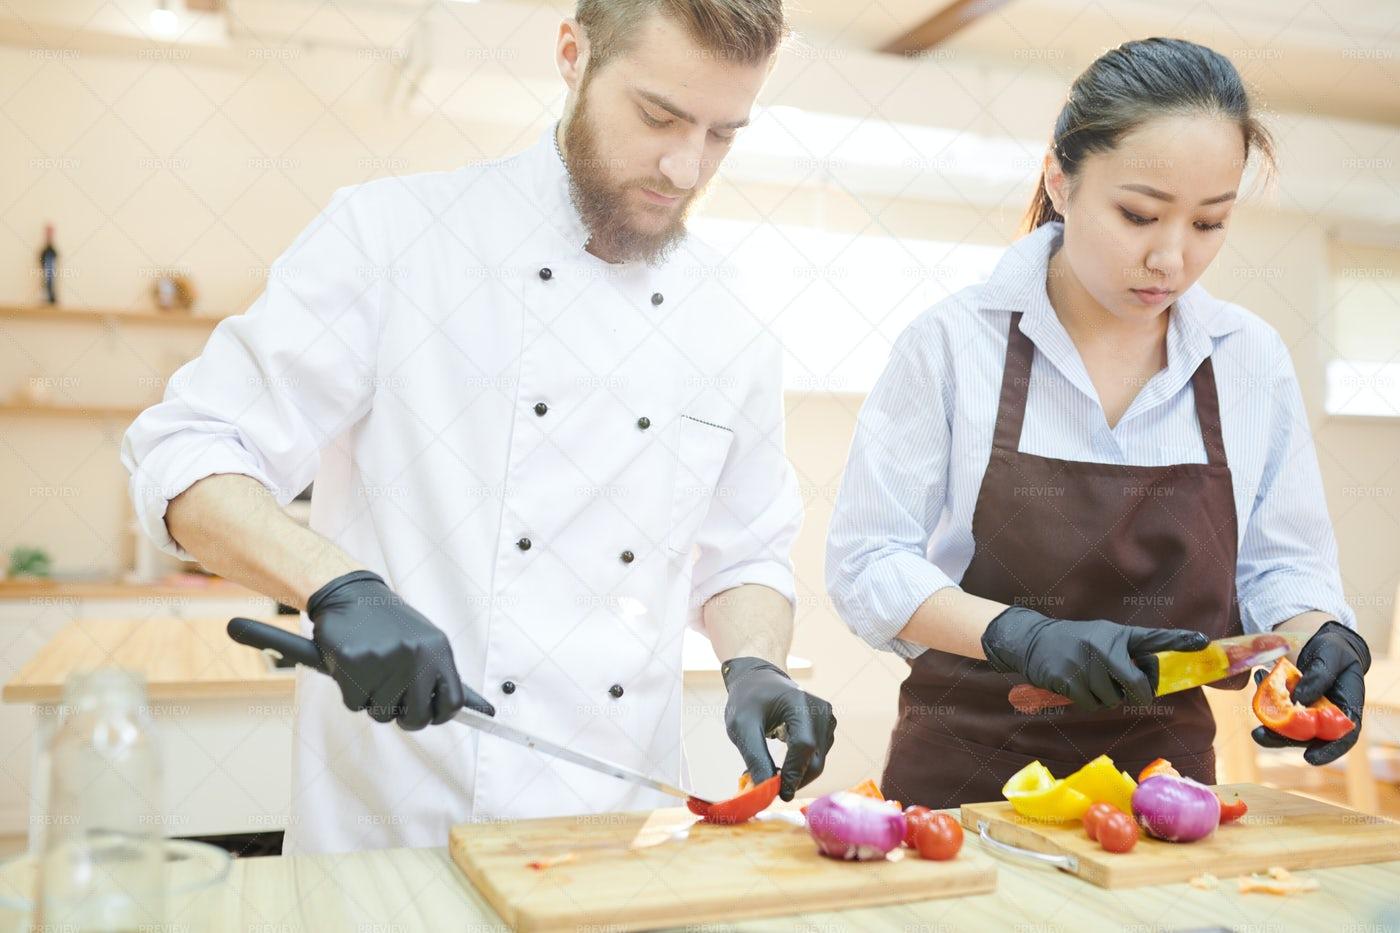 Two Modern Chefs Working In Kitchen: Stock Photos